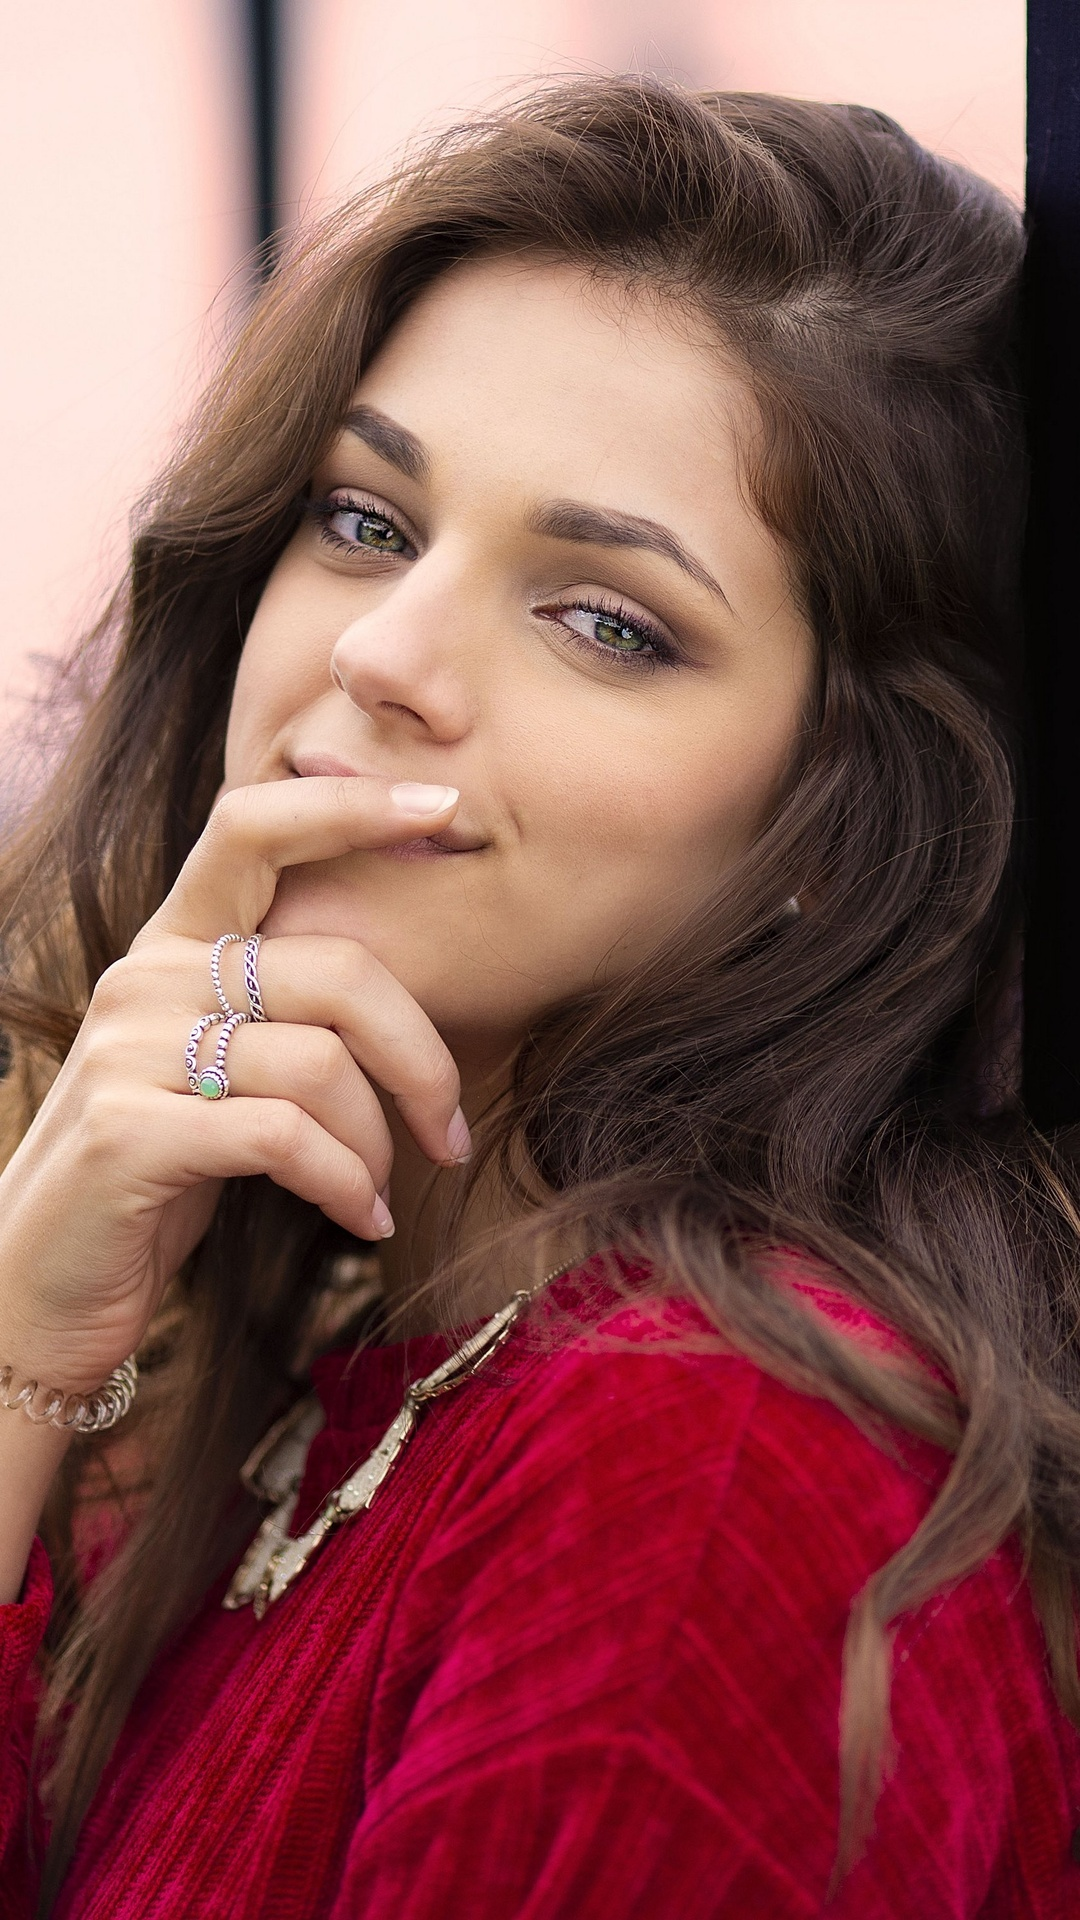 brown-hair-cute-girl-fingers-on-lips-4k-8a.jpg